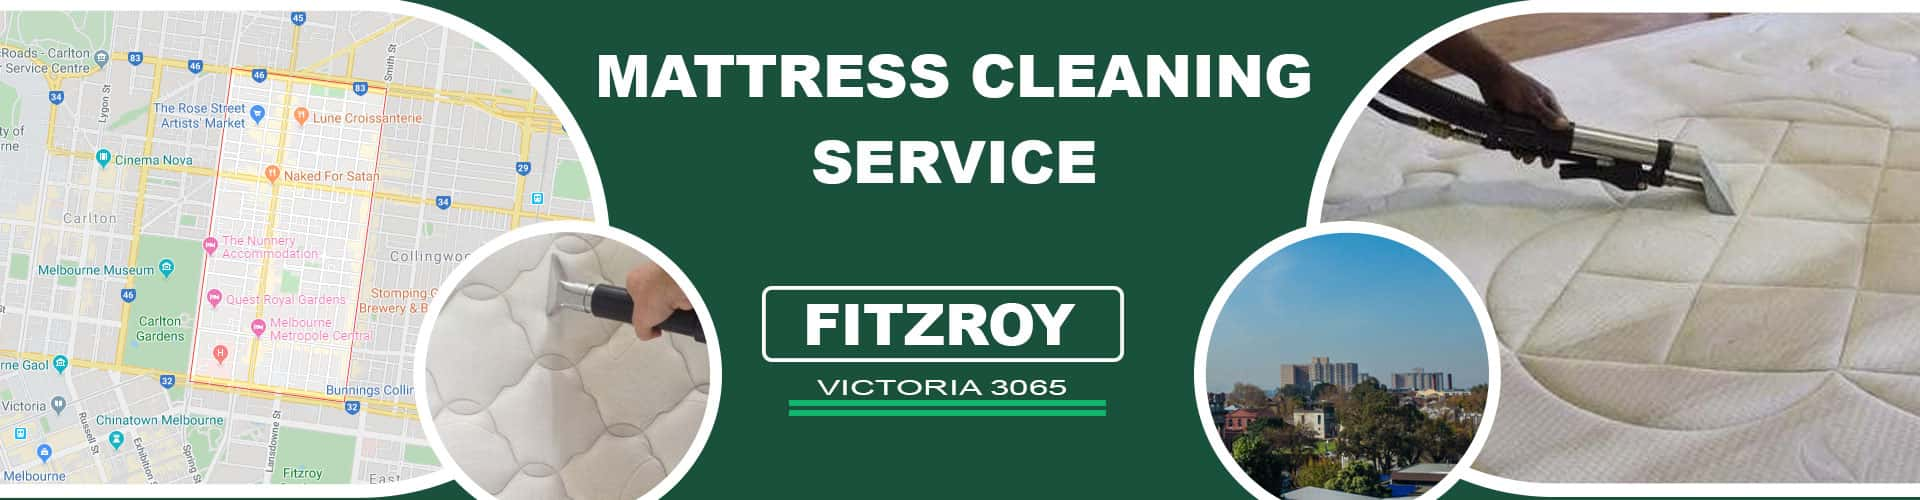 Mattress Cleaning Fitzroy